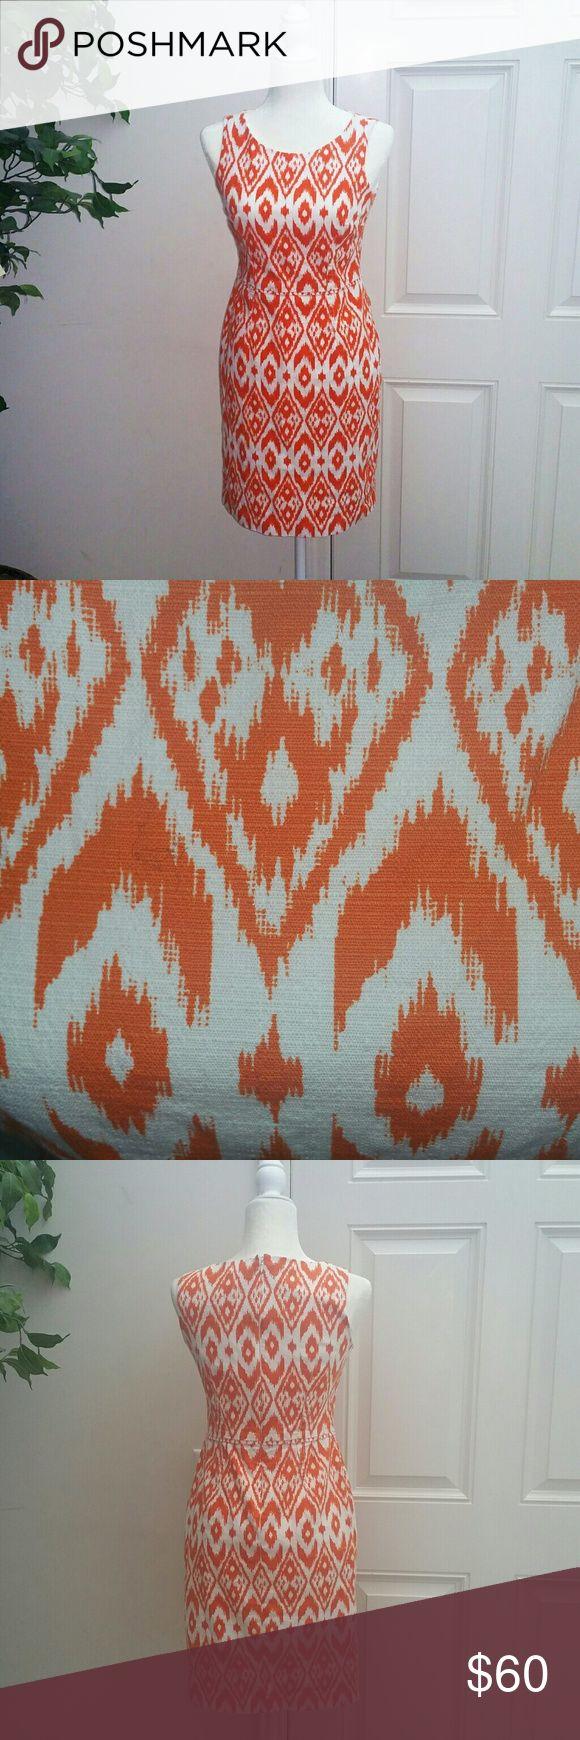 Nine West Orange Print Linen Dress Perfect for spring and summer Lightly worn Nine West Dresses Midi